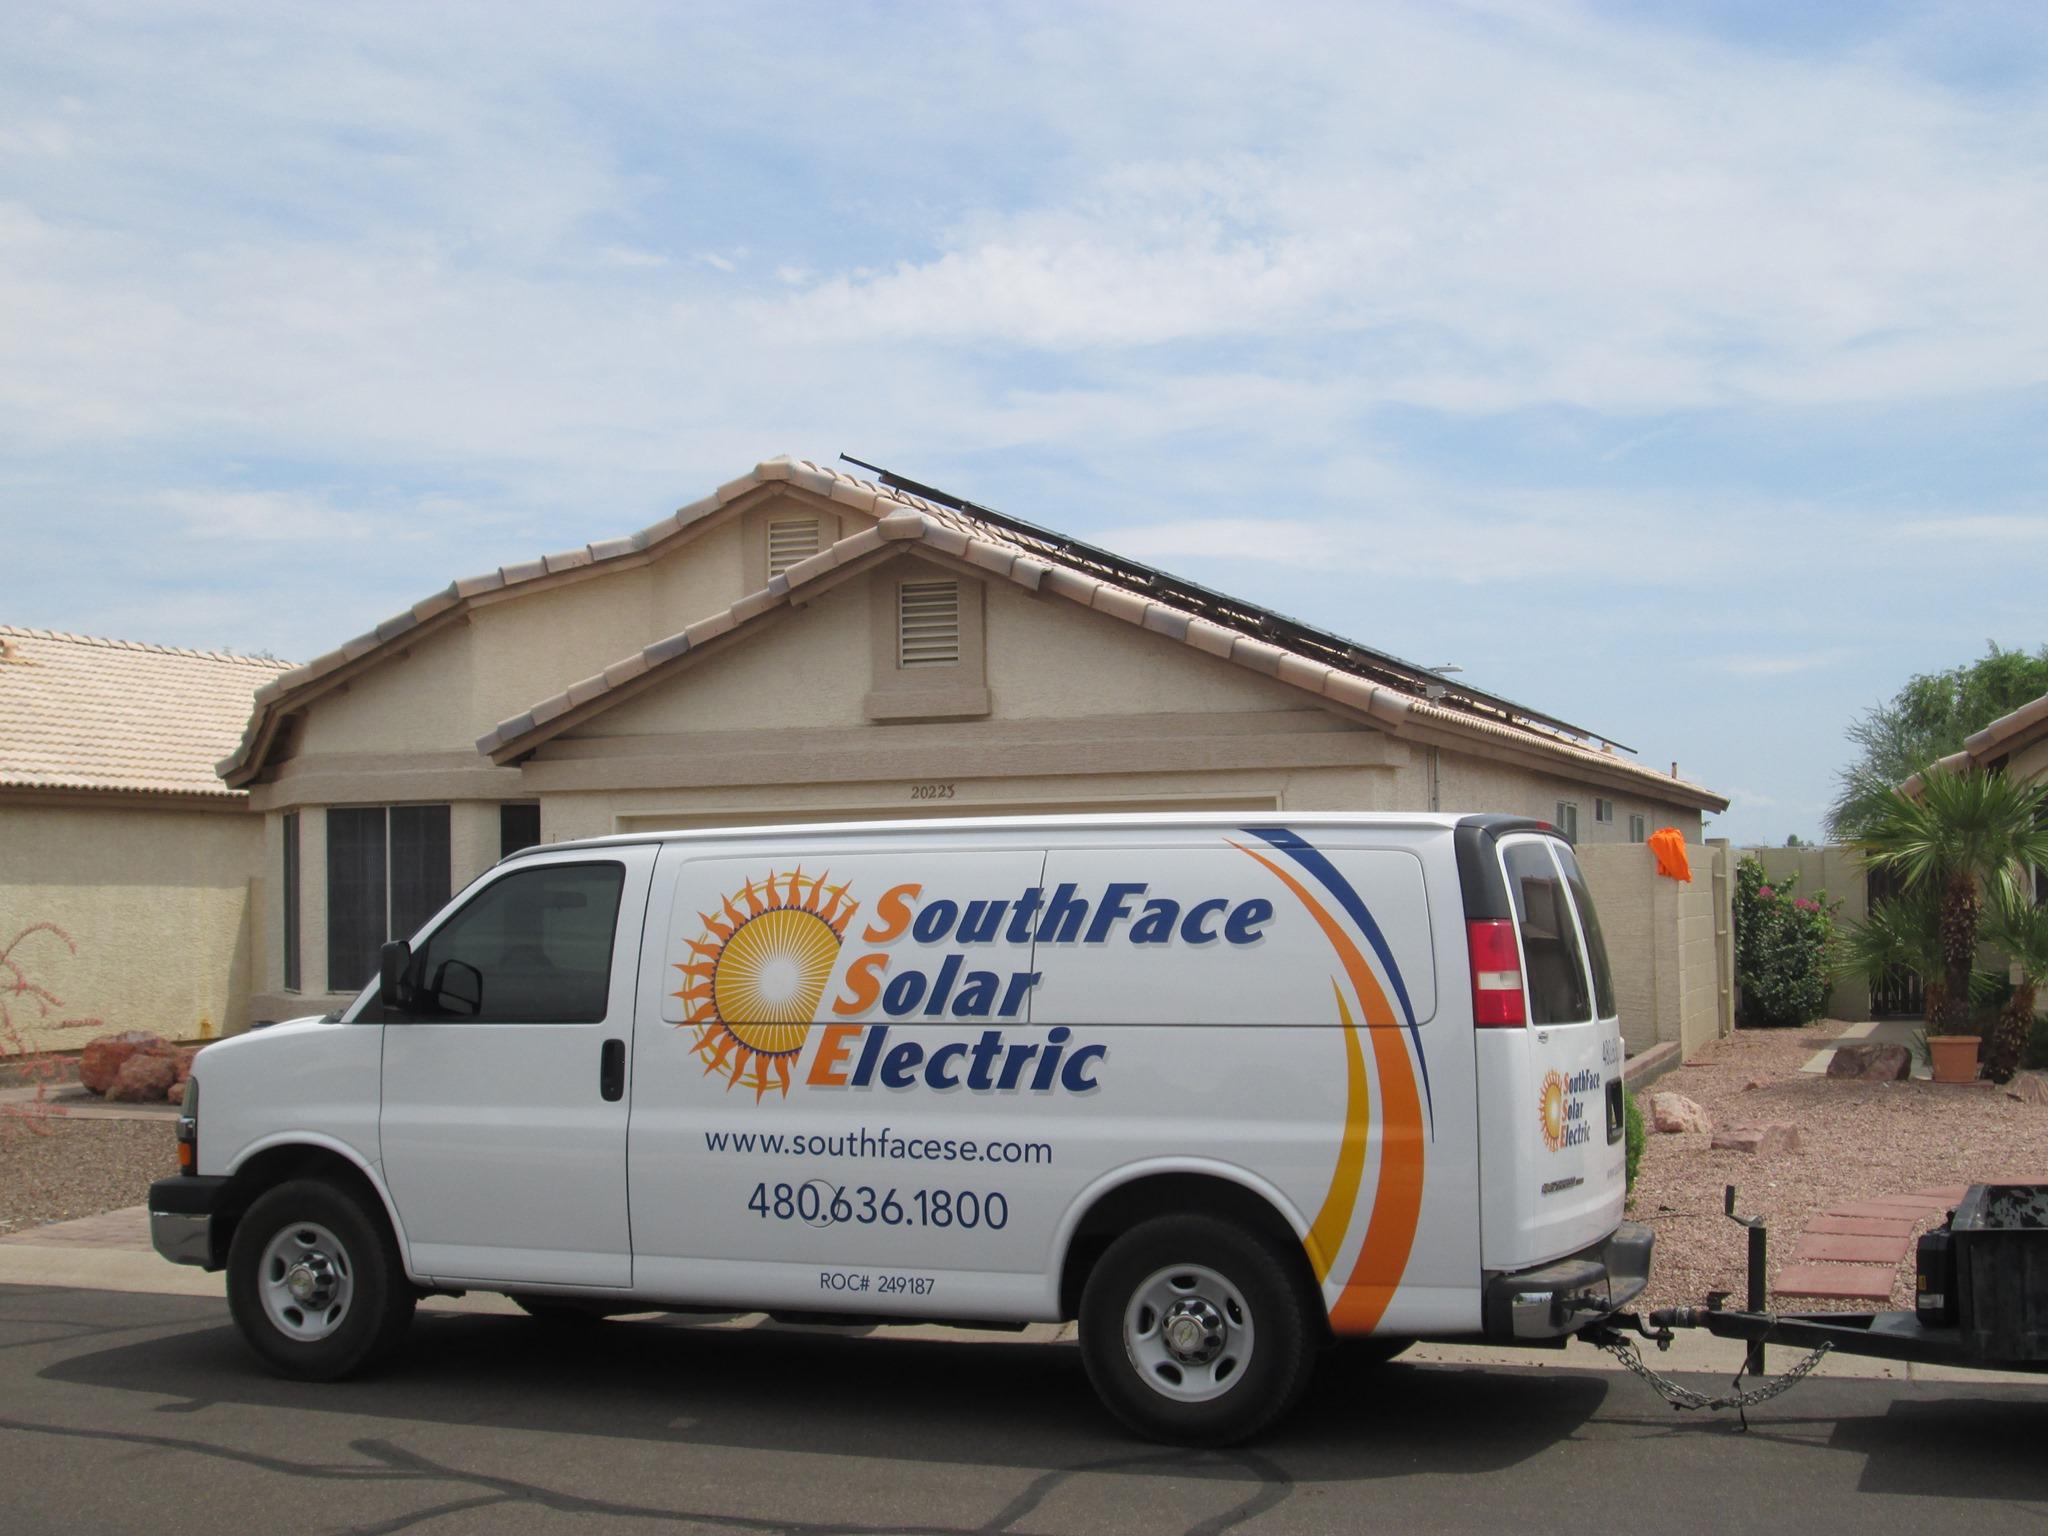 SouthFace Solar Truck